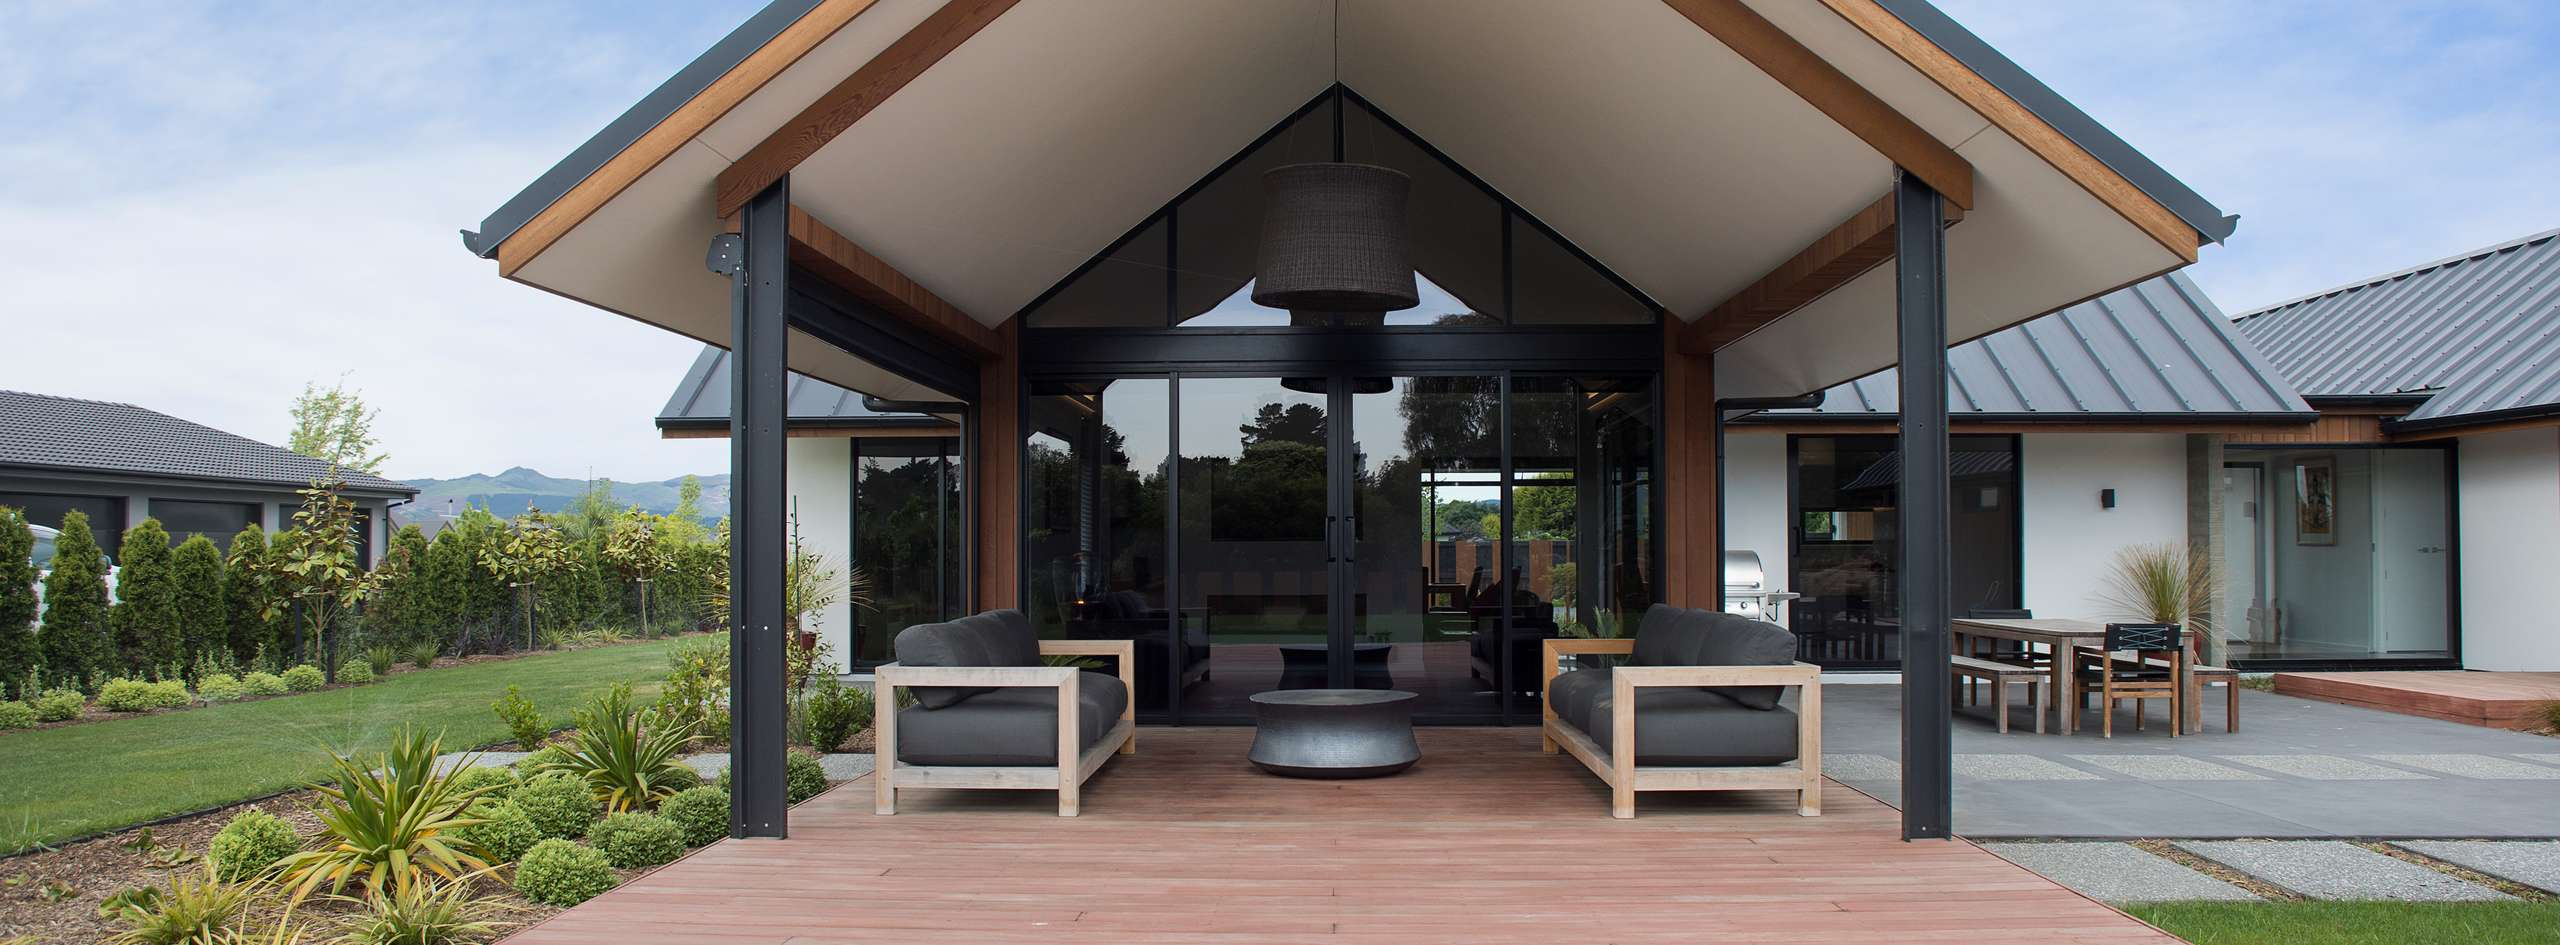 Turnkey Homes Christchurch